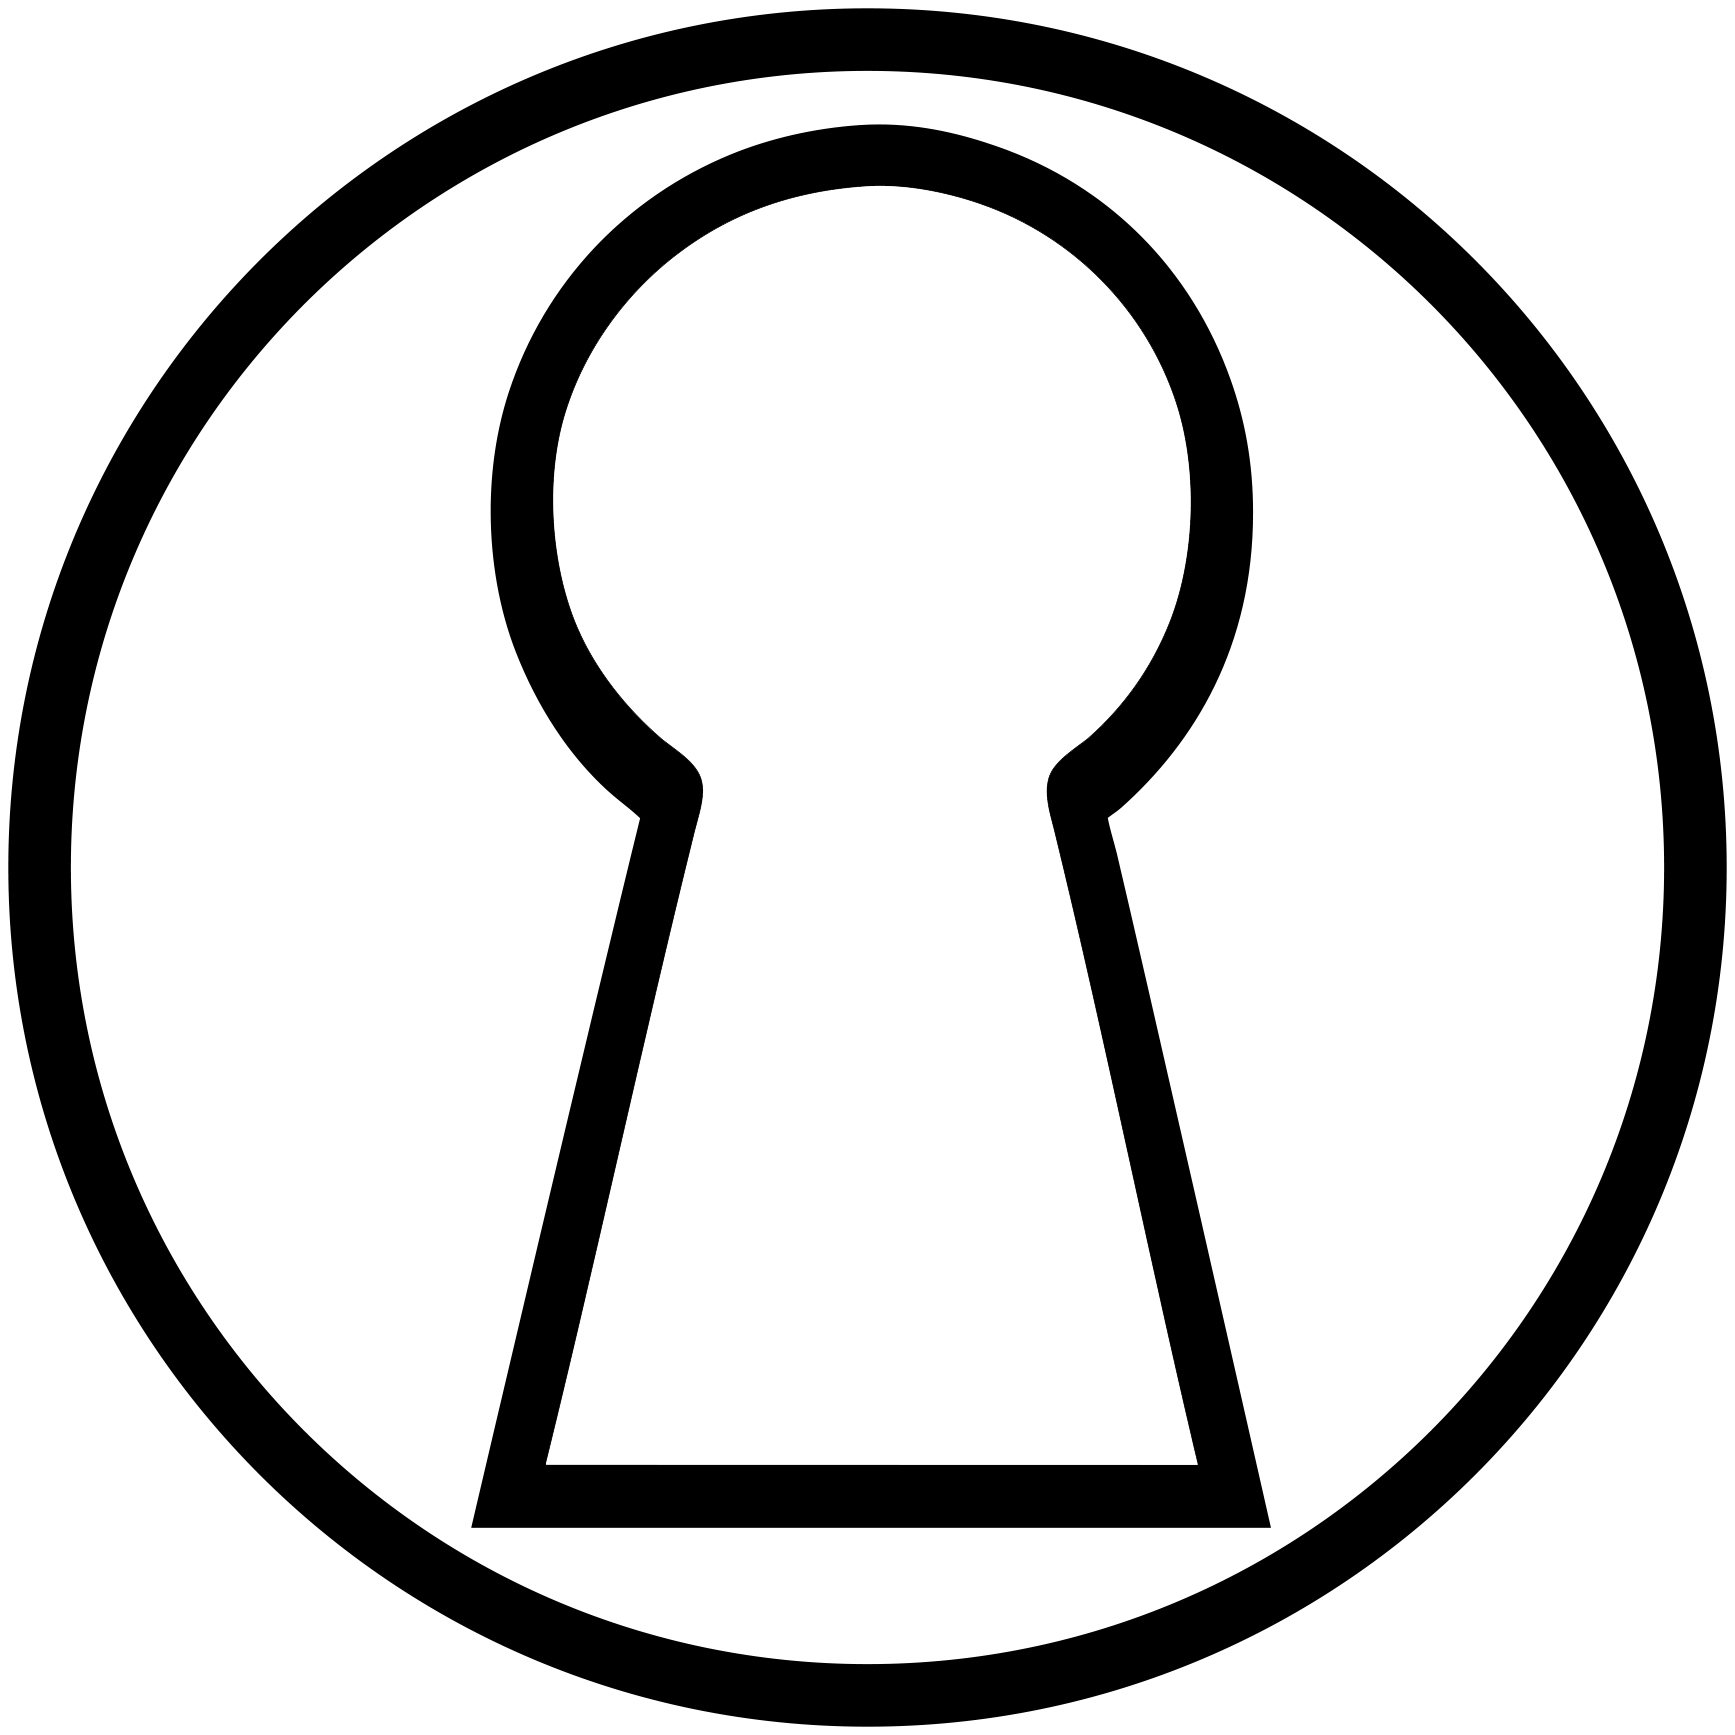 Key clipart keyhole, Key keyhole Transparent FREE for.